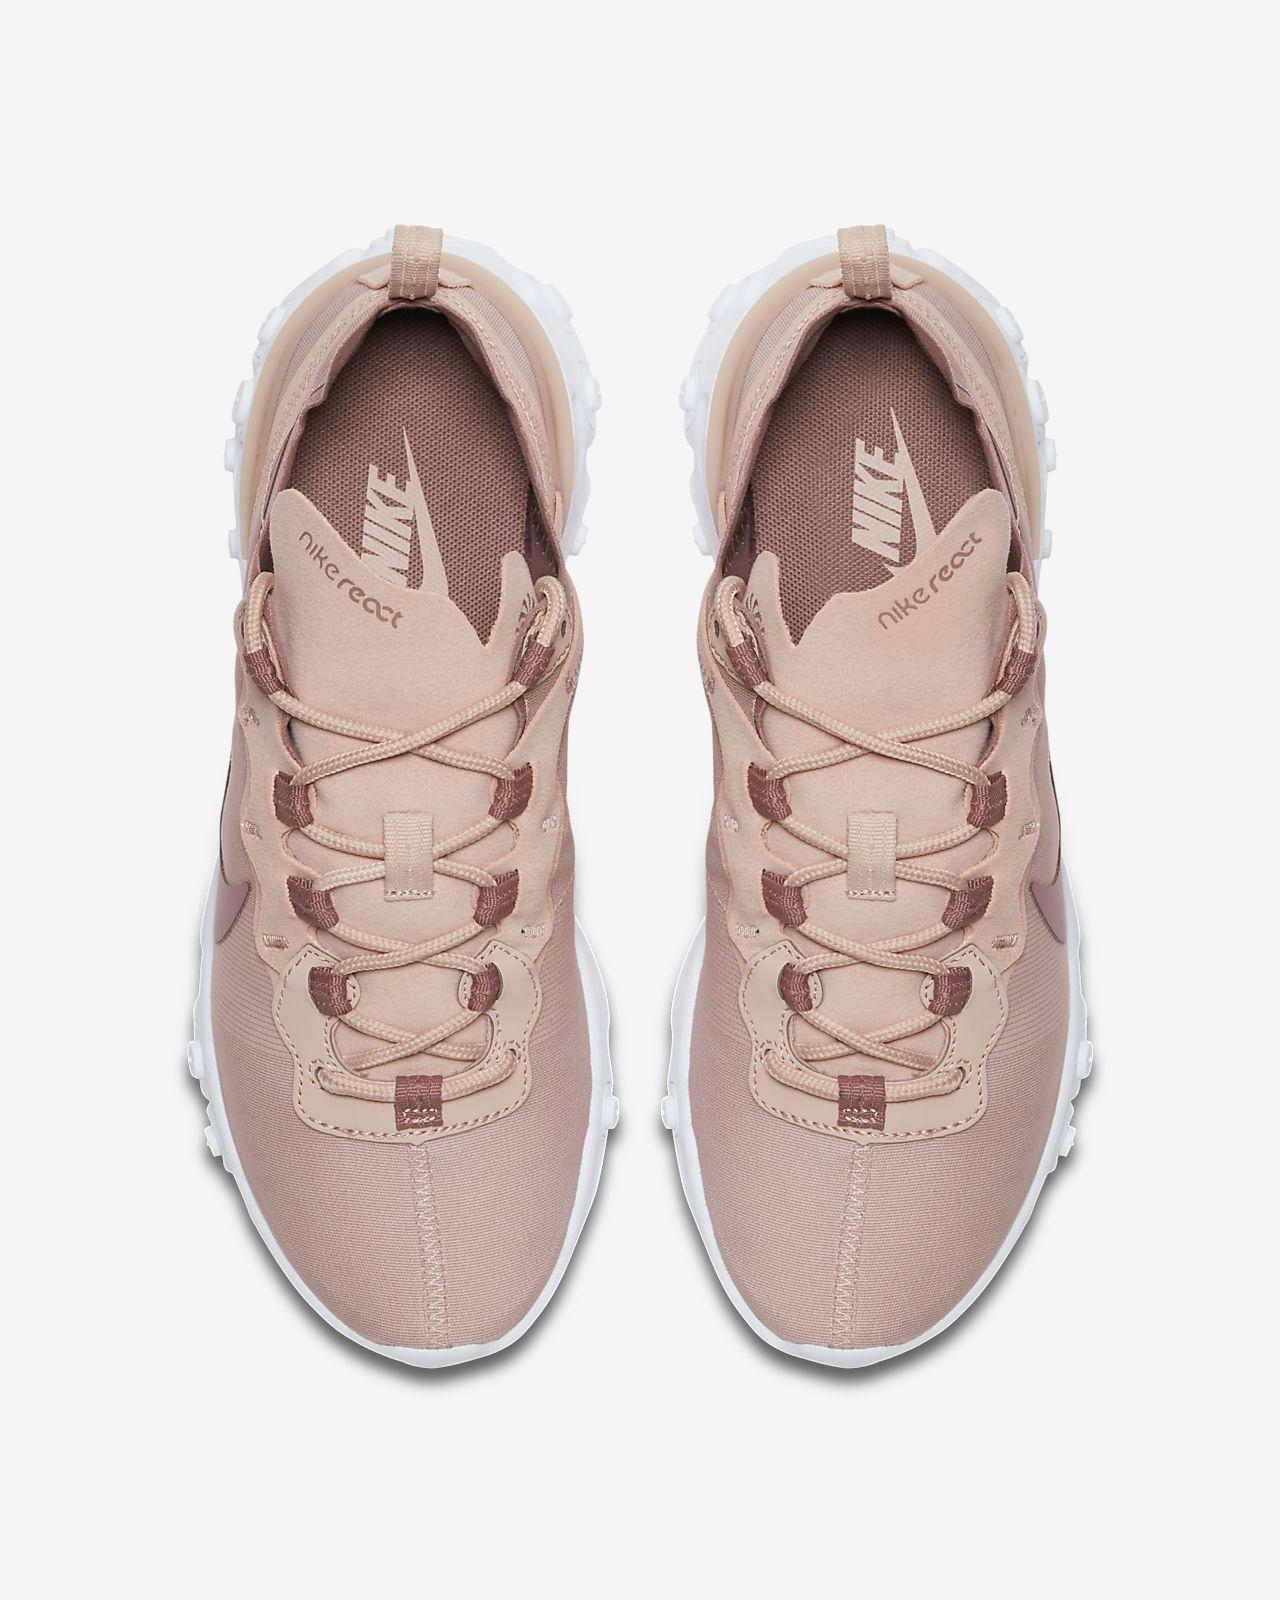 7c3912f1e8c Chaussure Nike React Element 55 pour Femme. Nike.com CA